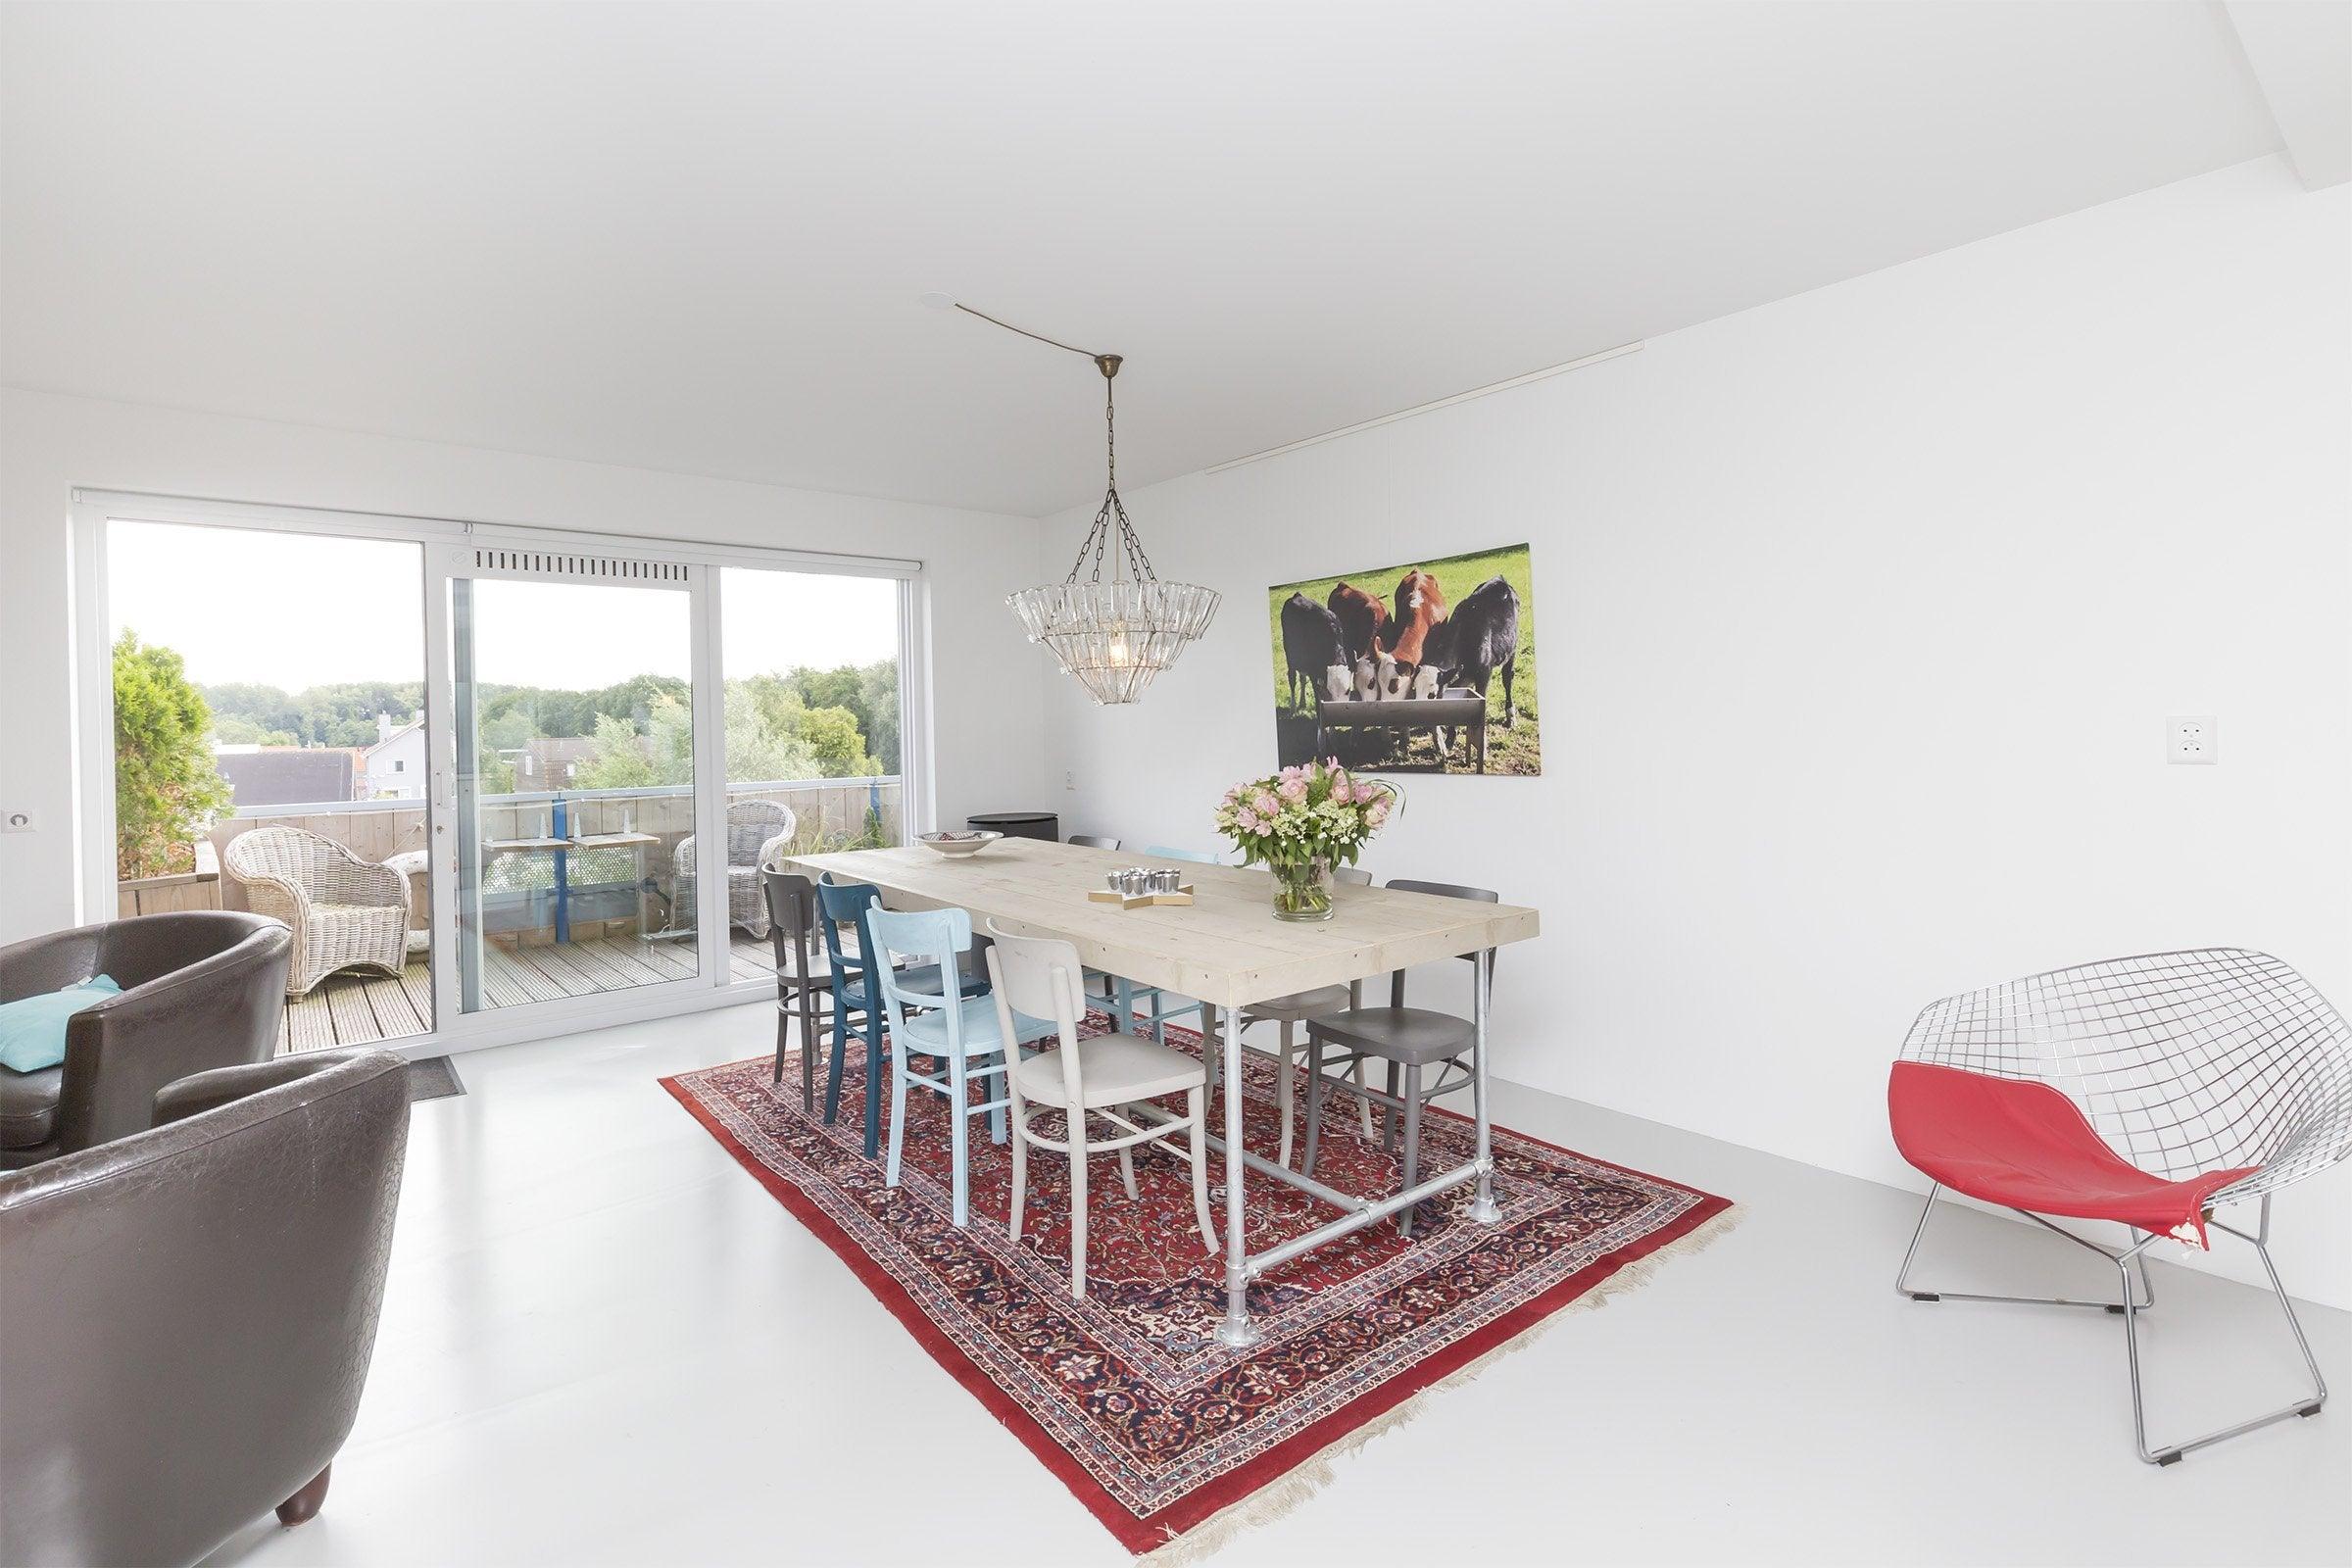 Port Broclede / Breukelen